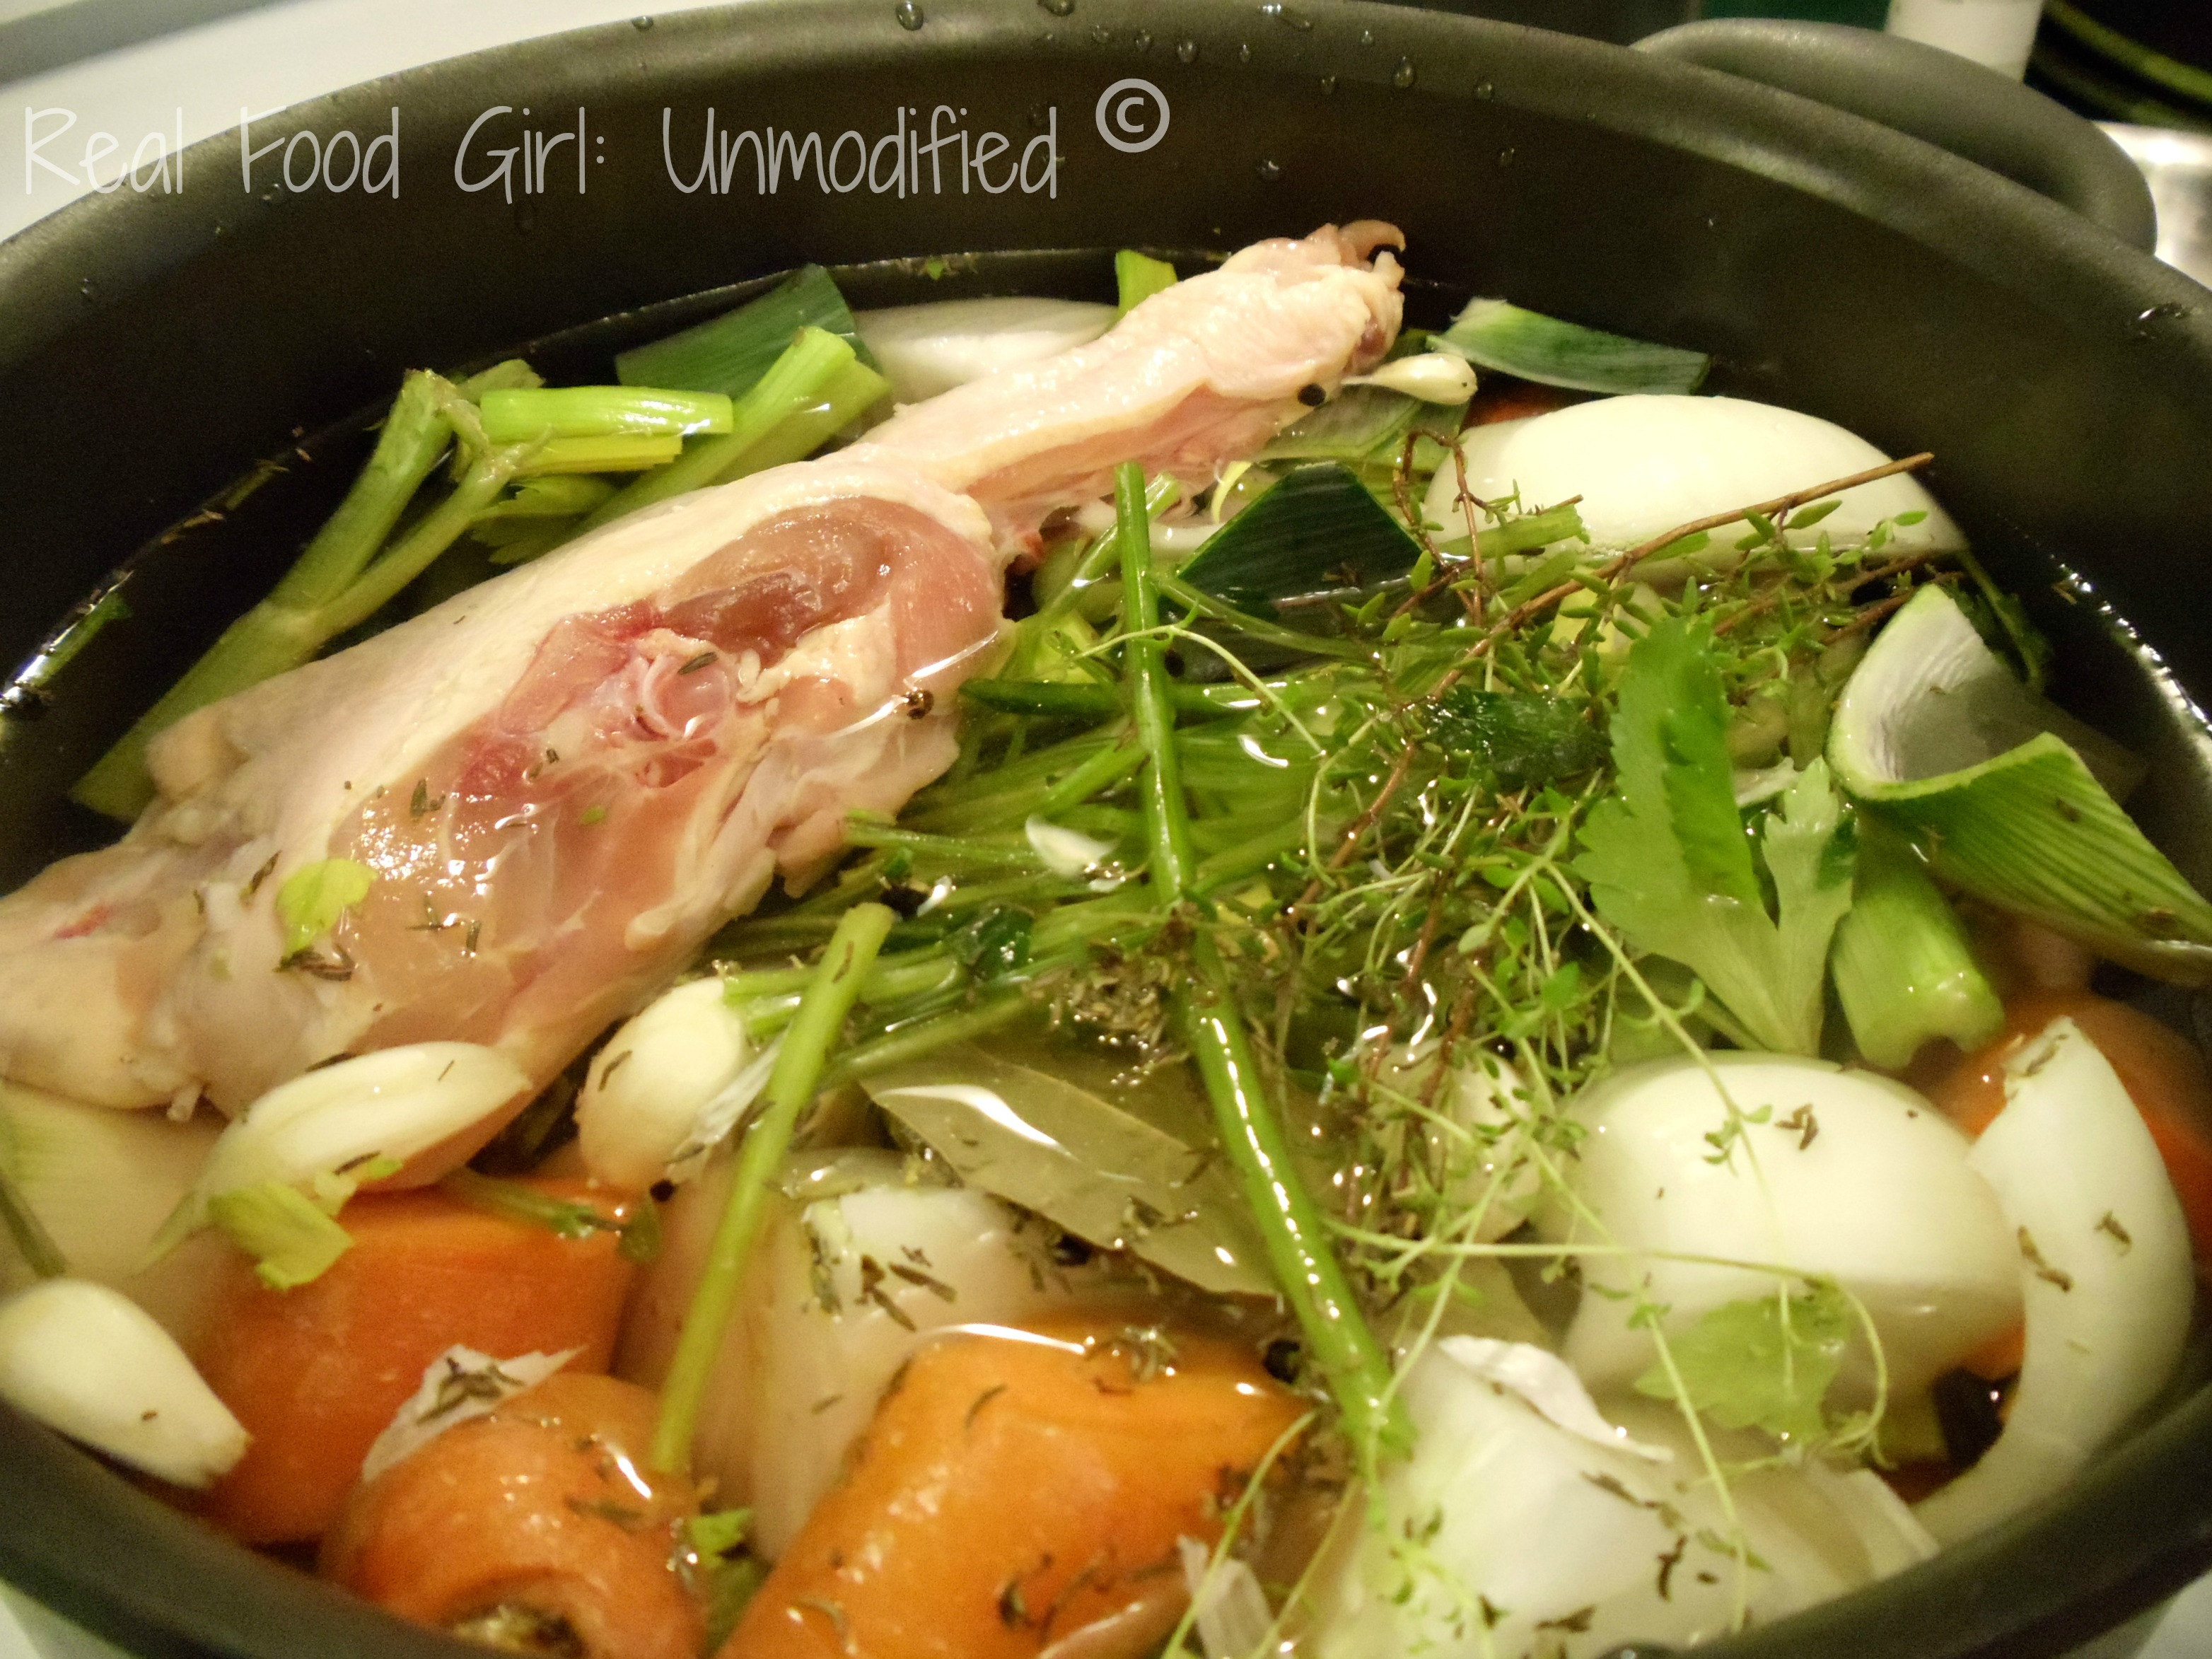 Homemade Non-GMO Beef Stock, beef stock, gmo free beef stock, gmo recipe, healthy beef stock